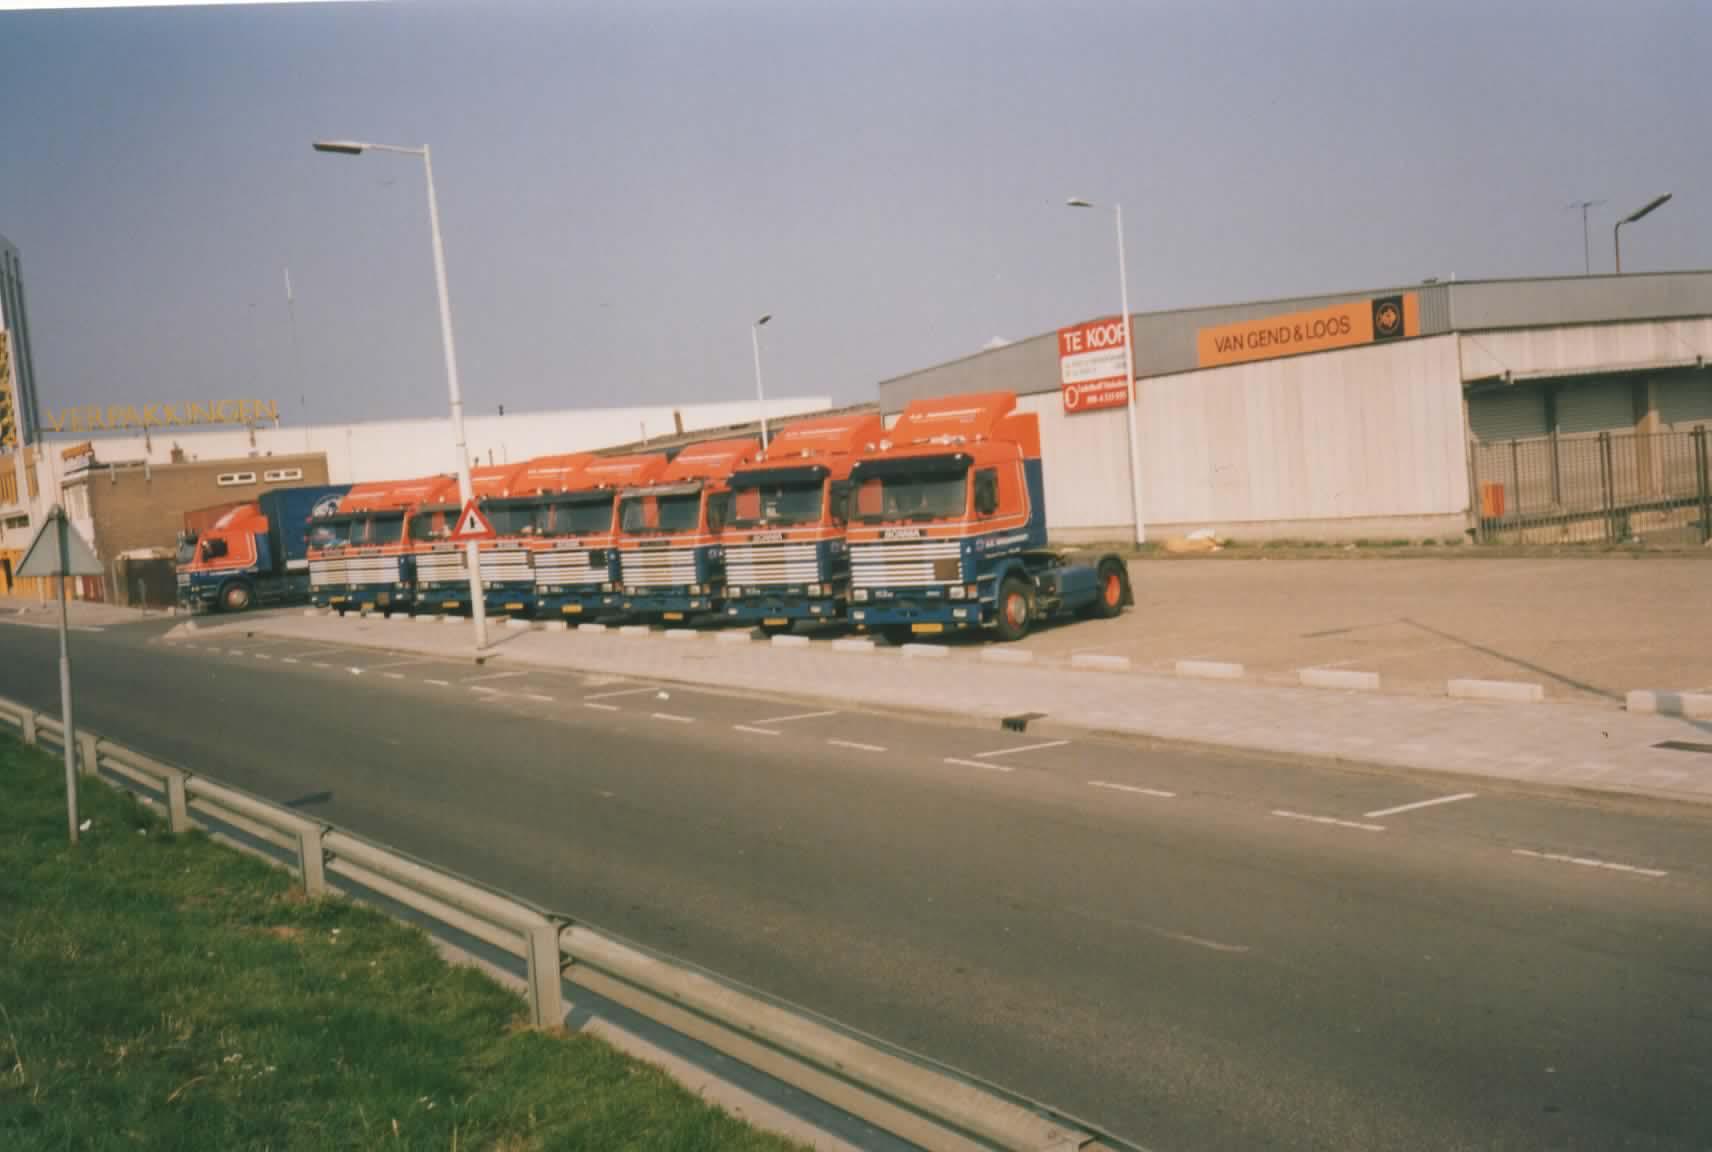 1992-stadionweg-Rotterdam-